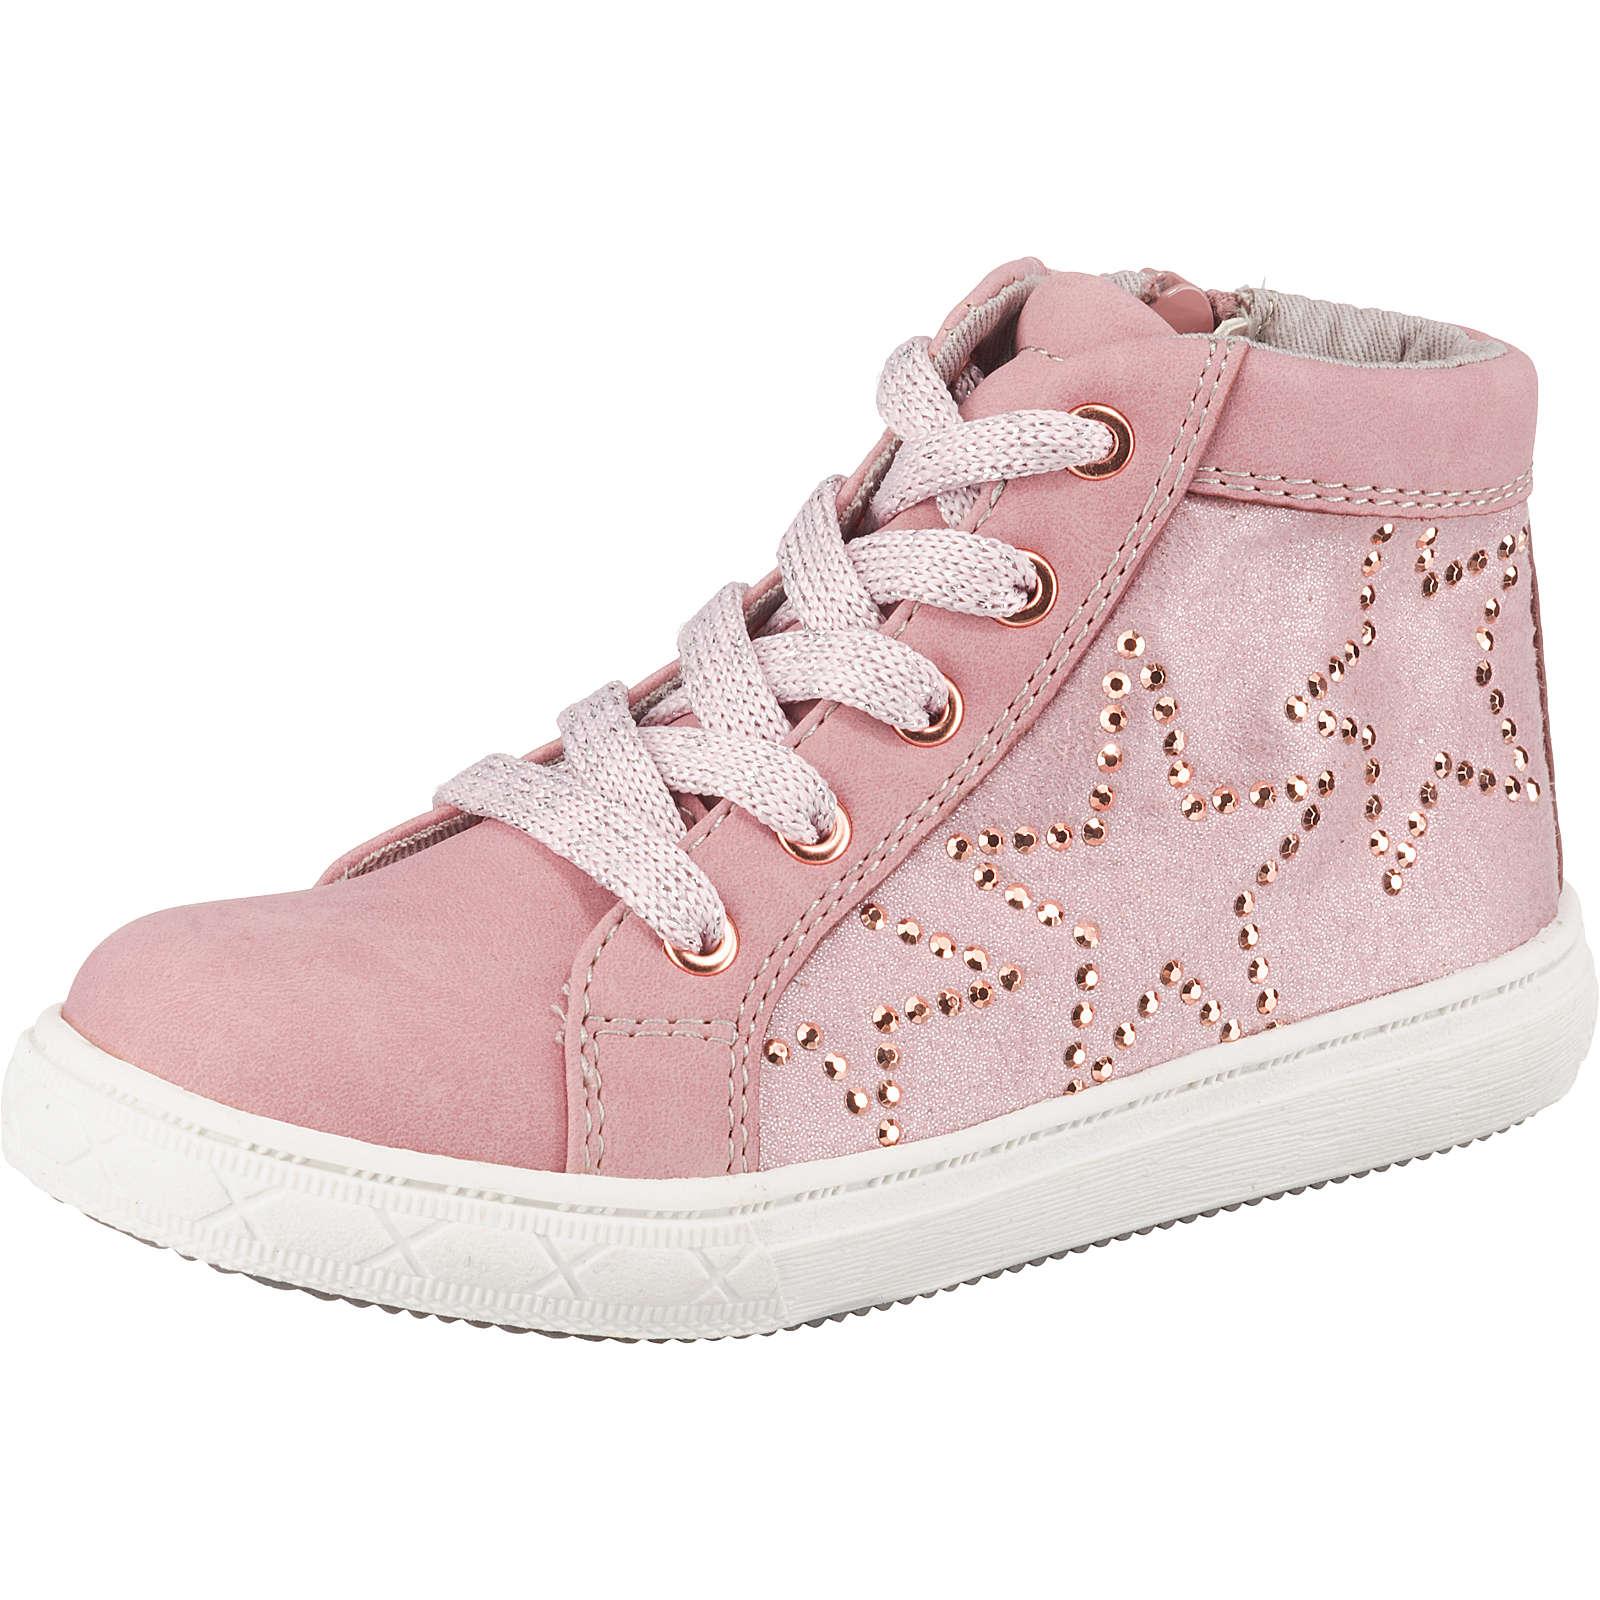 Be Mega Sneakers High für Mädchen rosa Mädchen Gr. 33